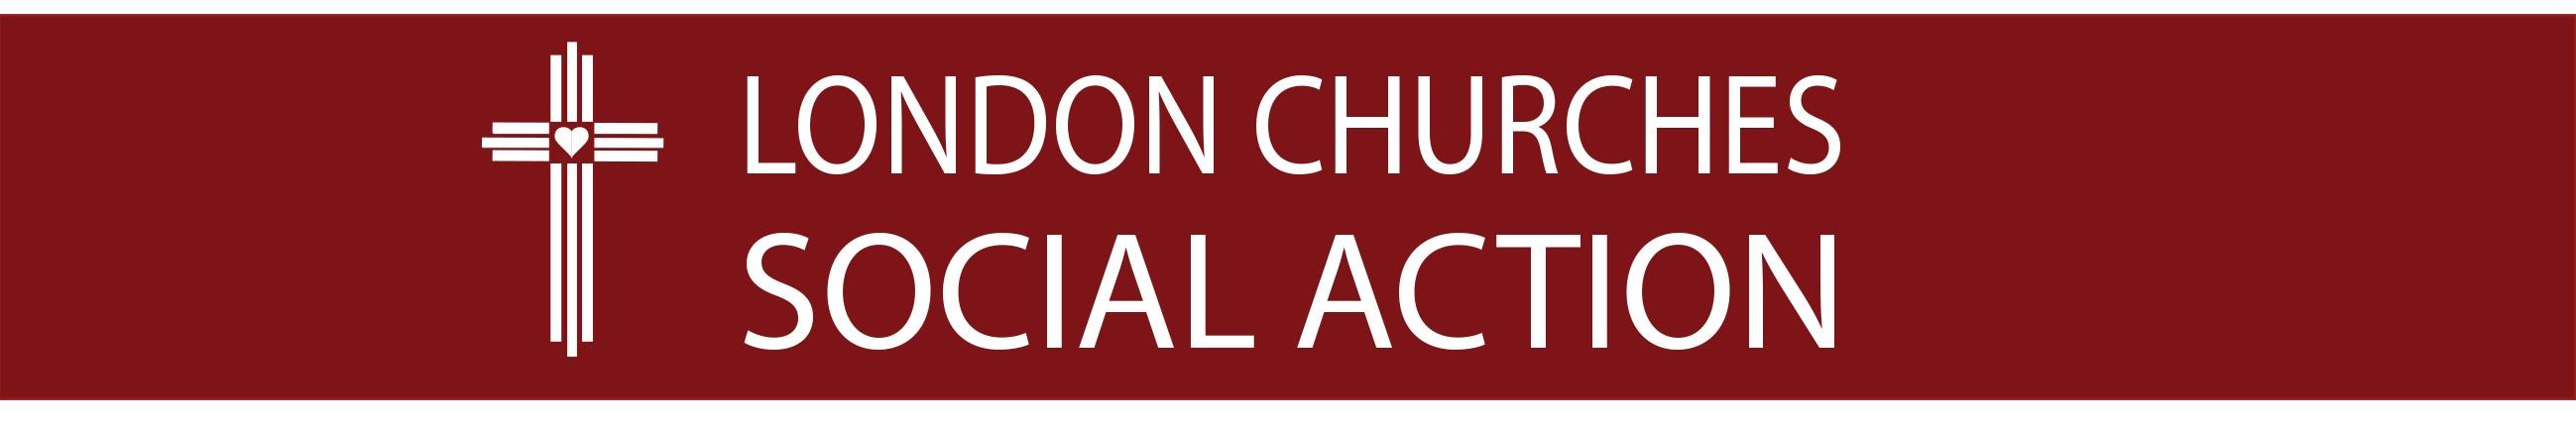 London Churches Social Action